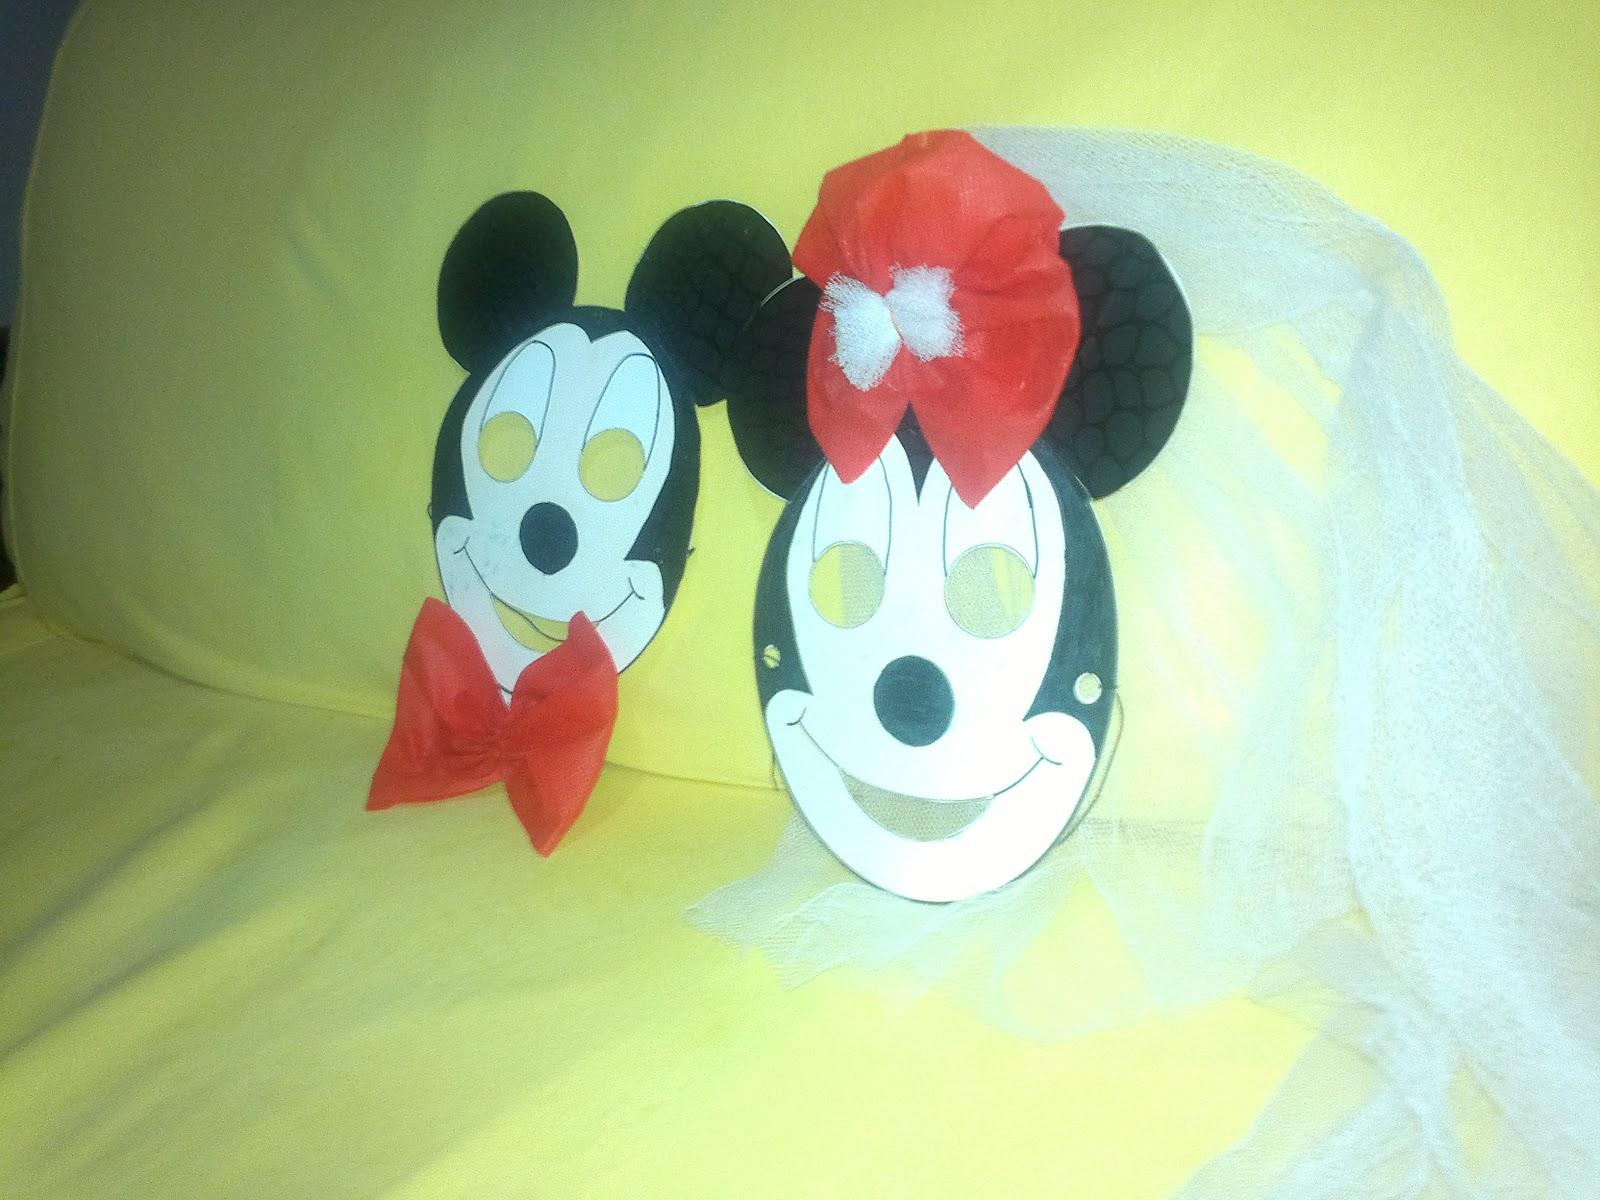 bayan mickey mouse, minnie mouse, maske çalışması